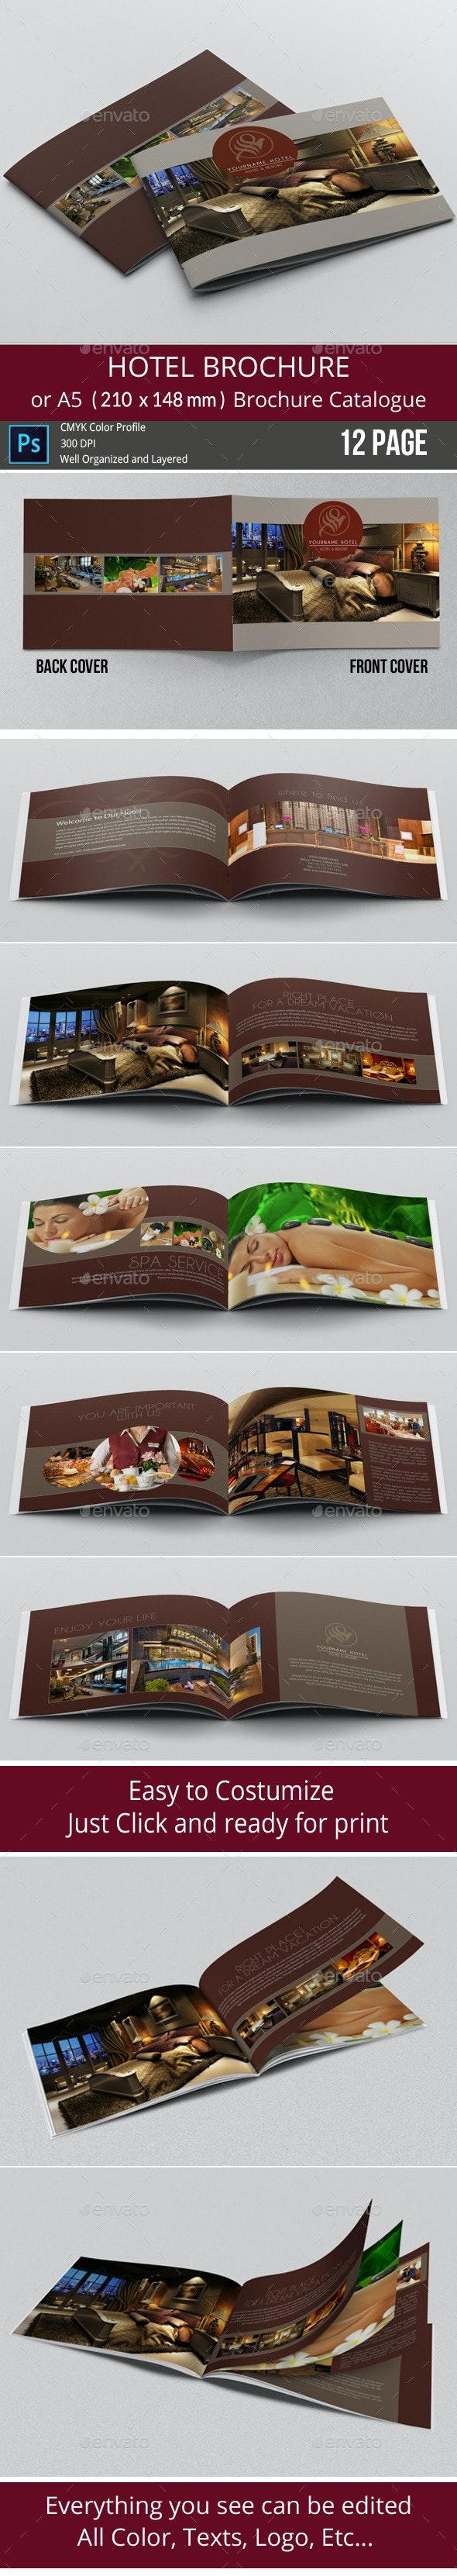 Hotel Brochure / Simple A5 Catalogue - Brochures Print Templates